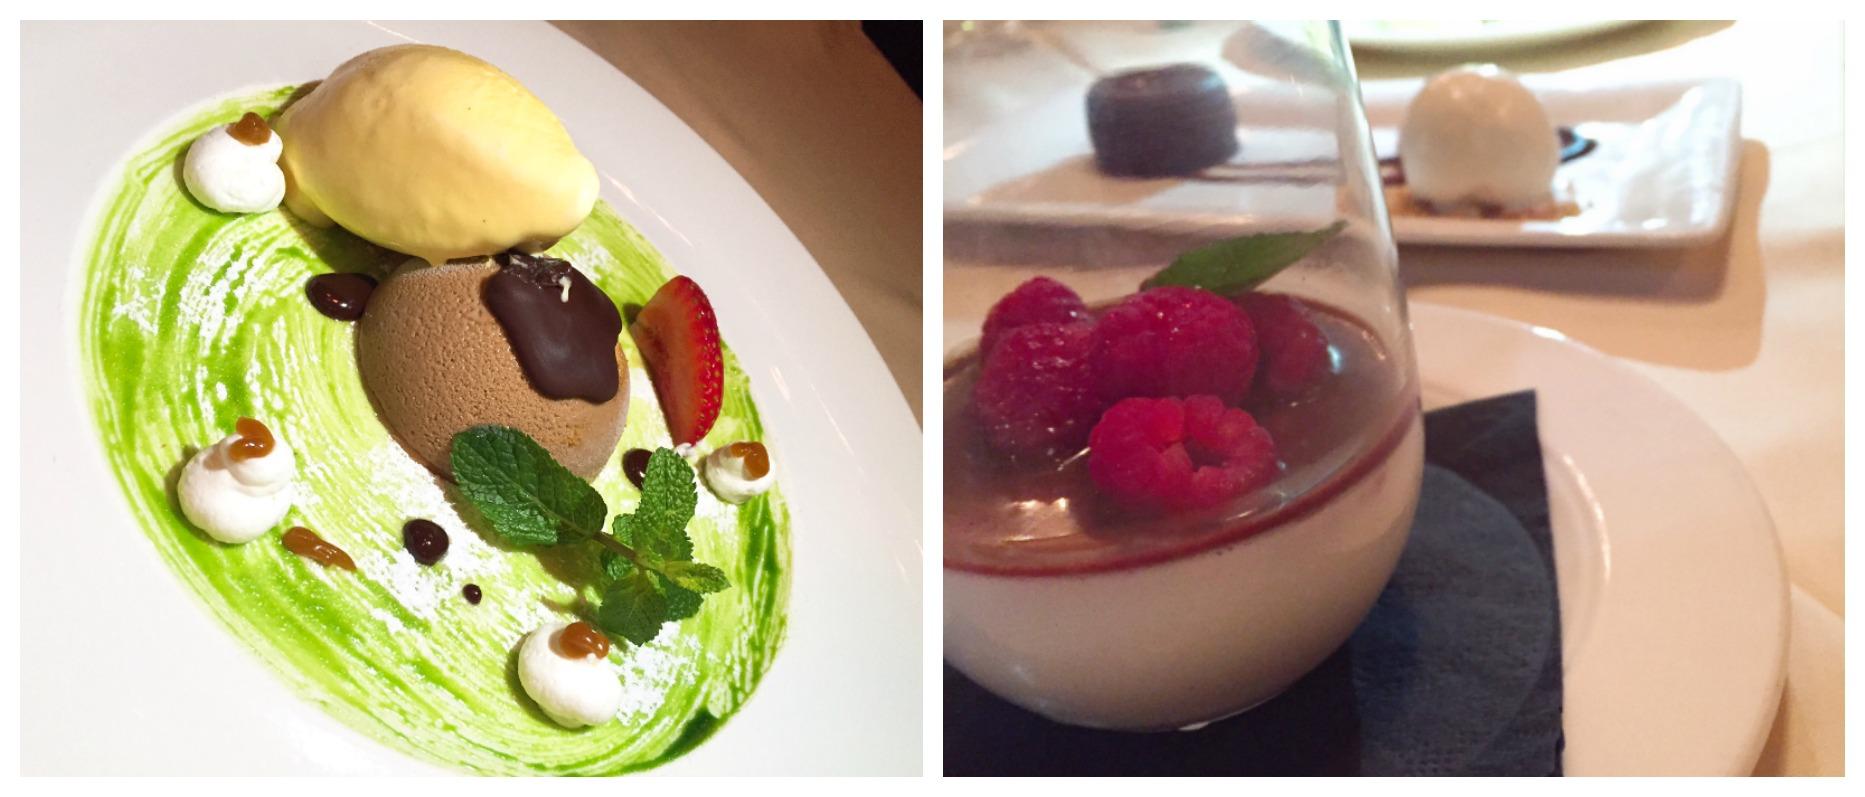 Quattro Miami Beach desserts